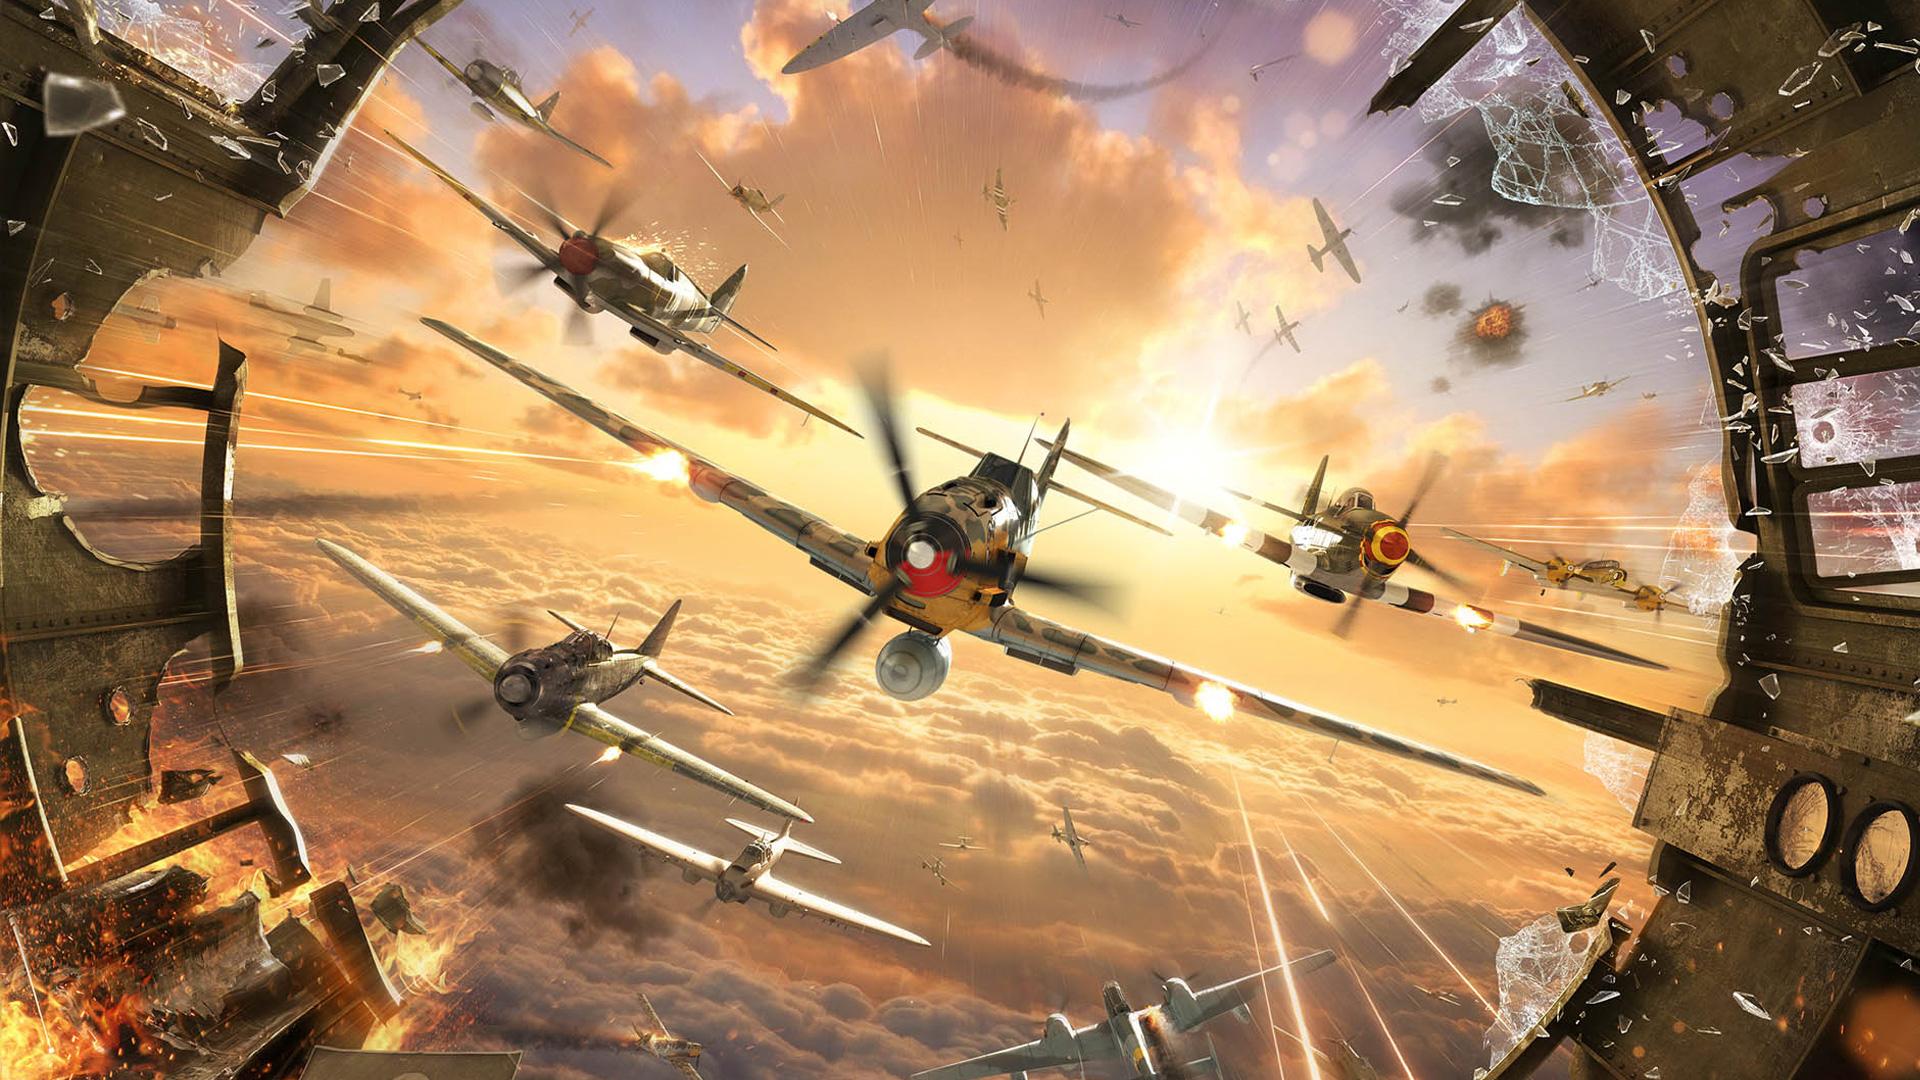 Free World of Warplanes Wallpaper in 1920x1080